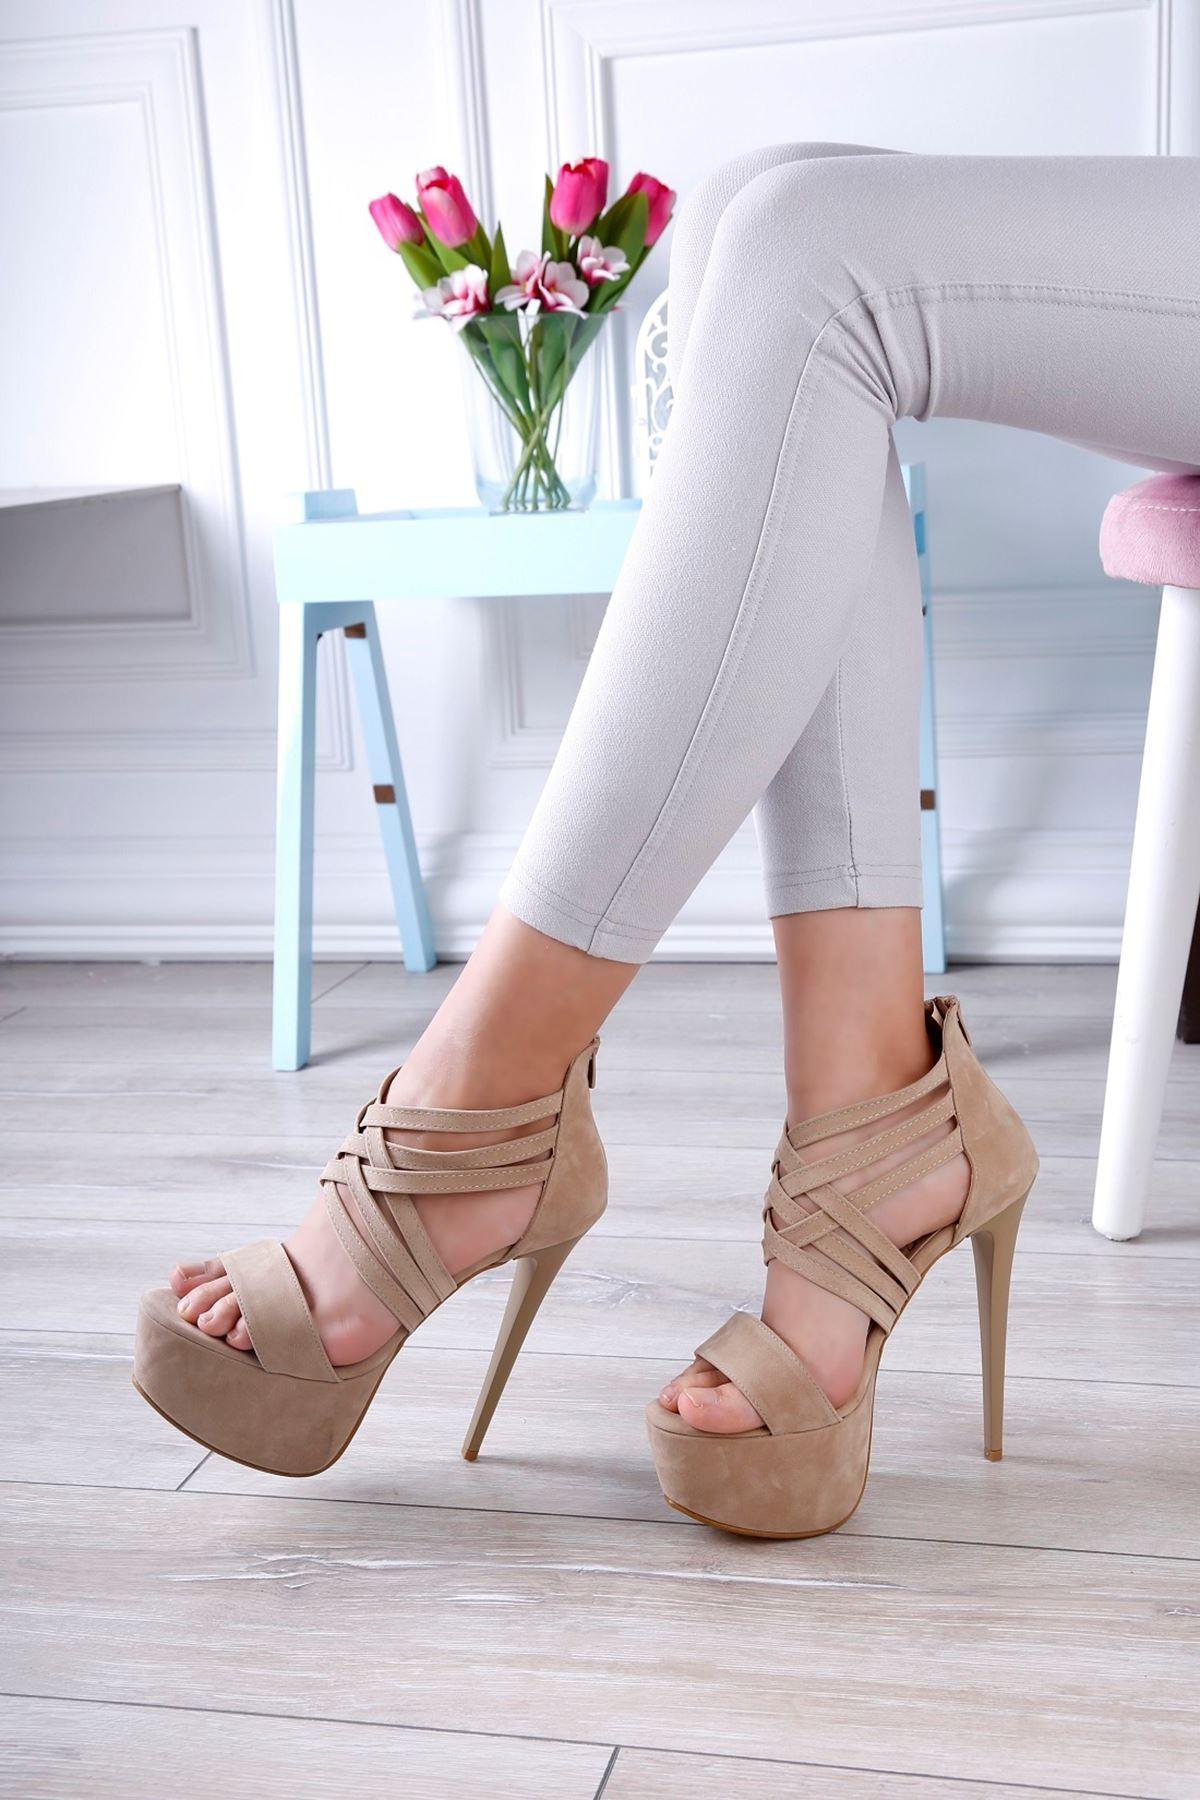 ÇESİL Vizon Platform Topuklu Süet Ayakkabı